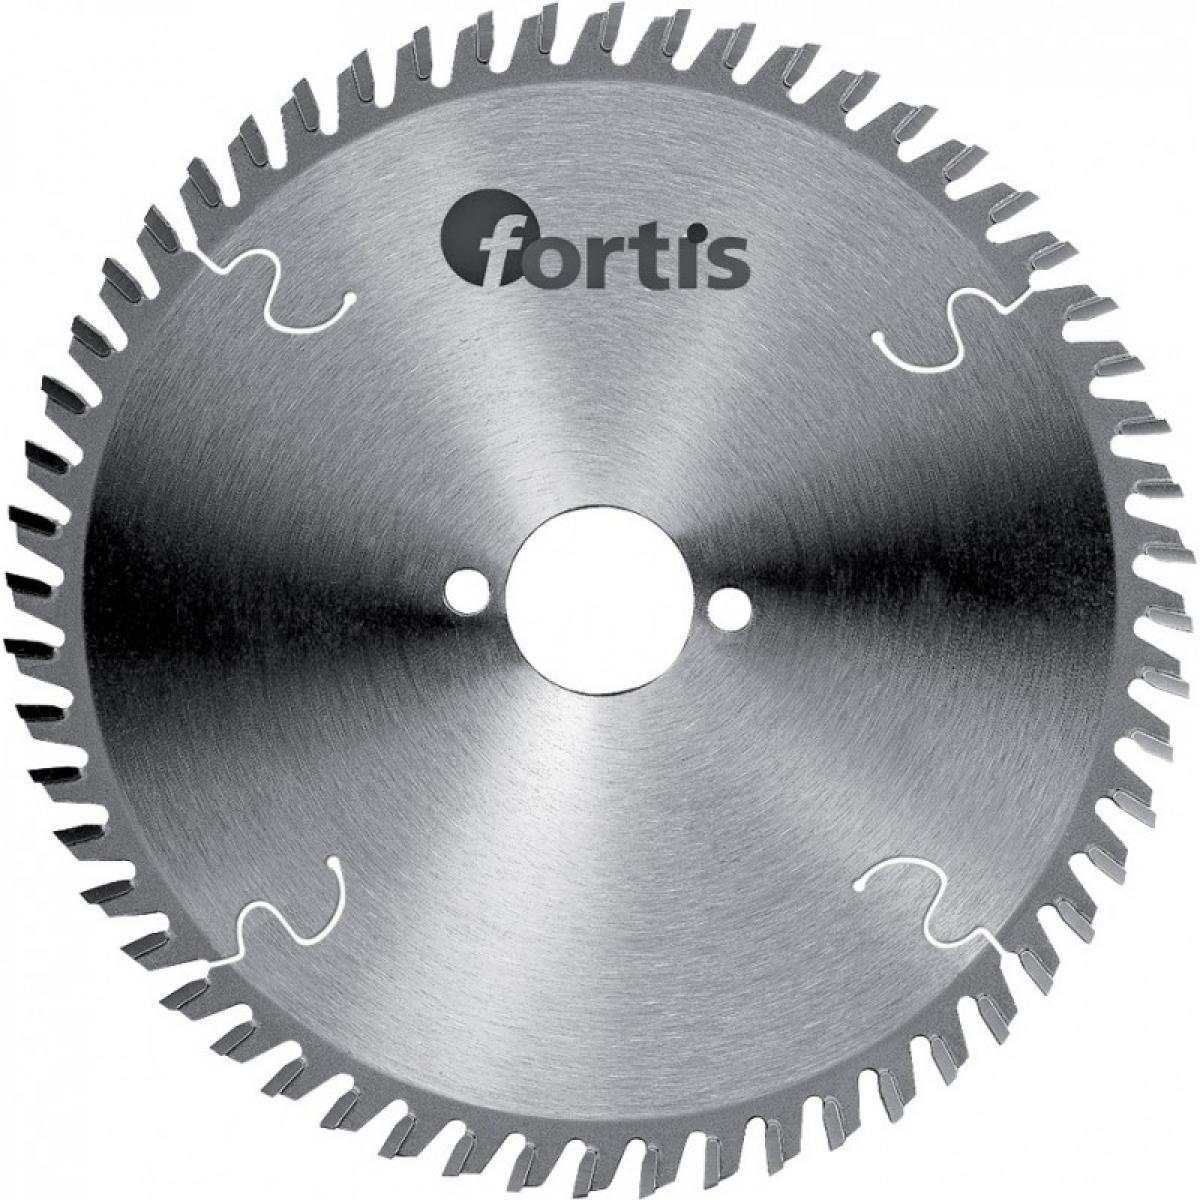 Fortis HW-Lame scie 190x2,8 x30mm Z56W Fortis